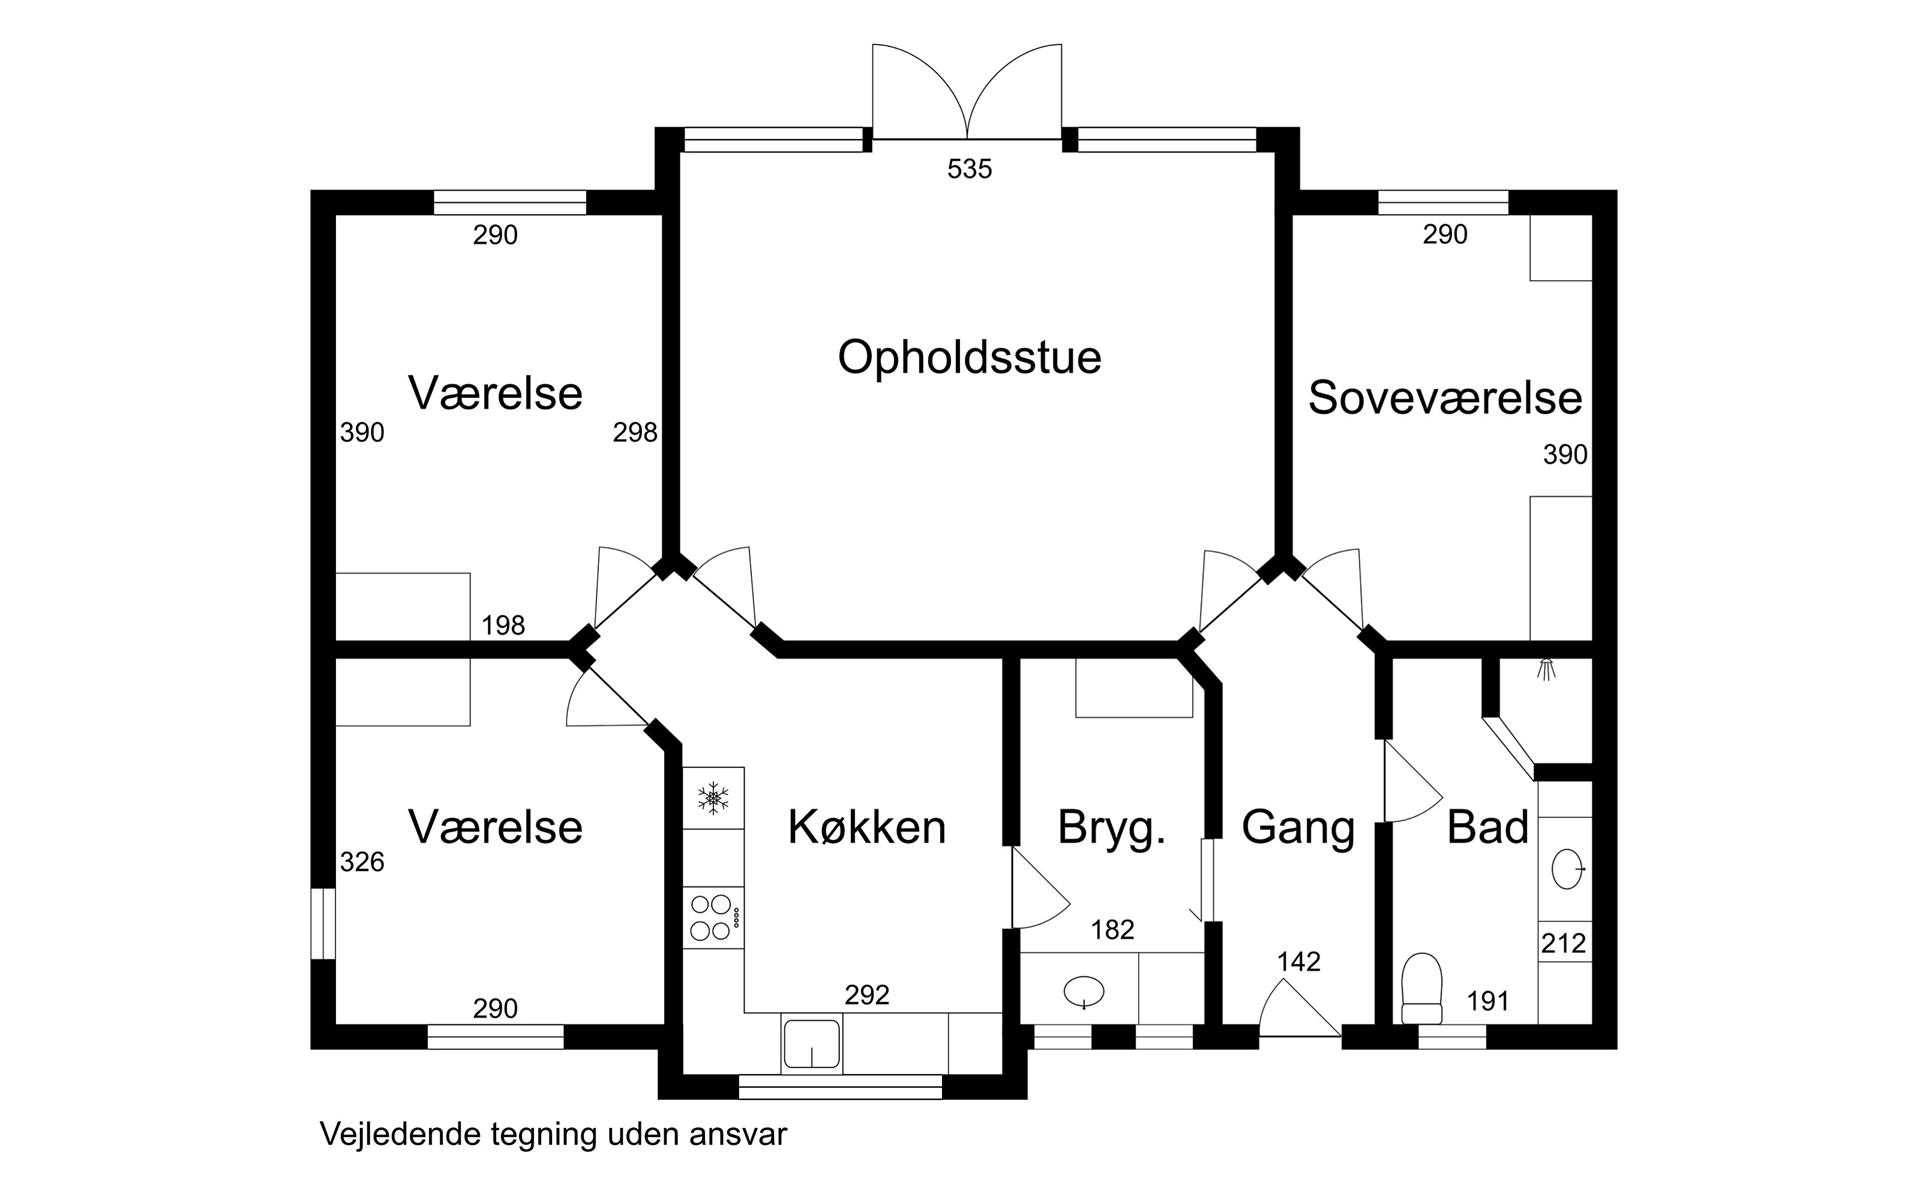 Rækkehus på Kobberupvej i Holstebro - Plantegning